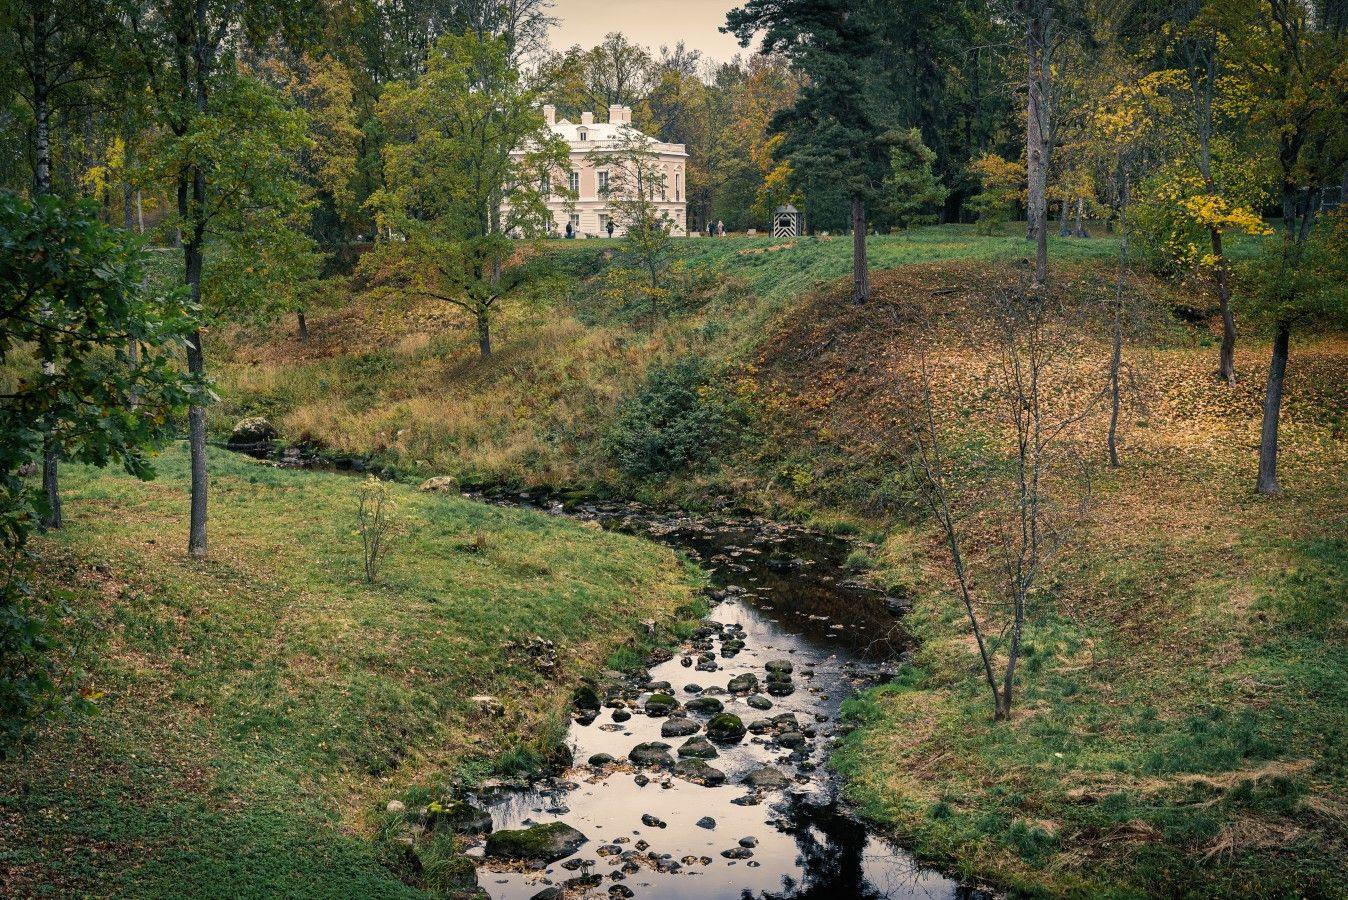 Пейзаж с дворцом Петра III петербург ораниенбаум парк осень река